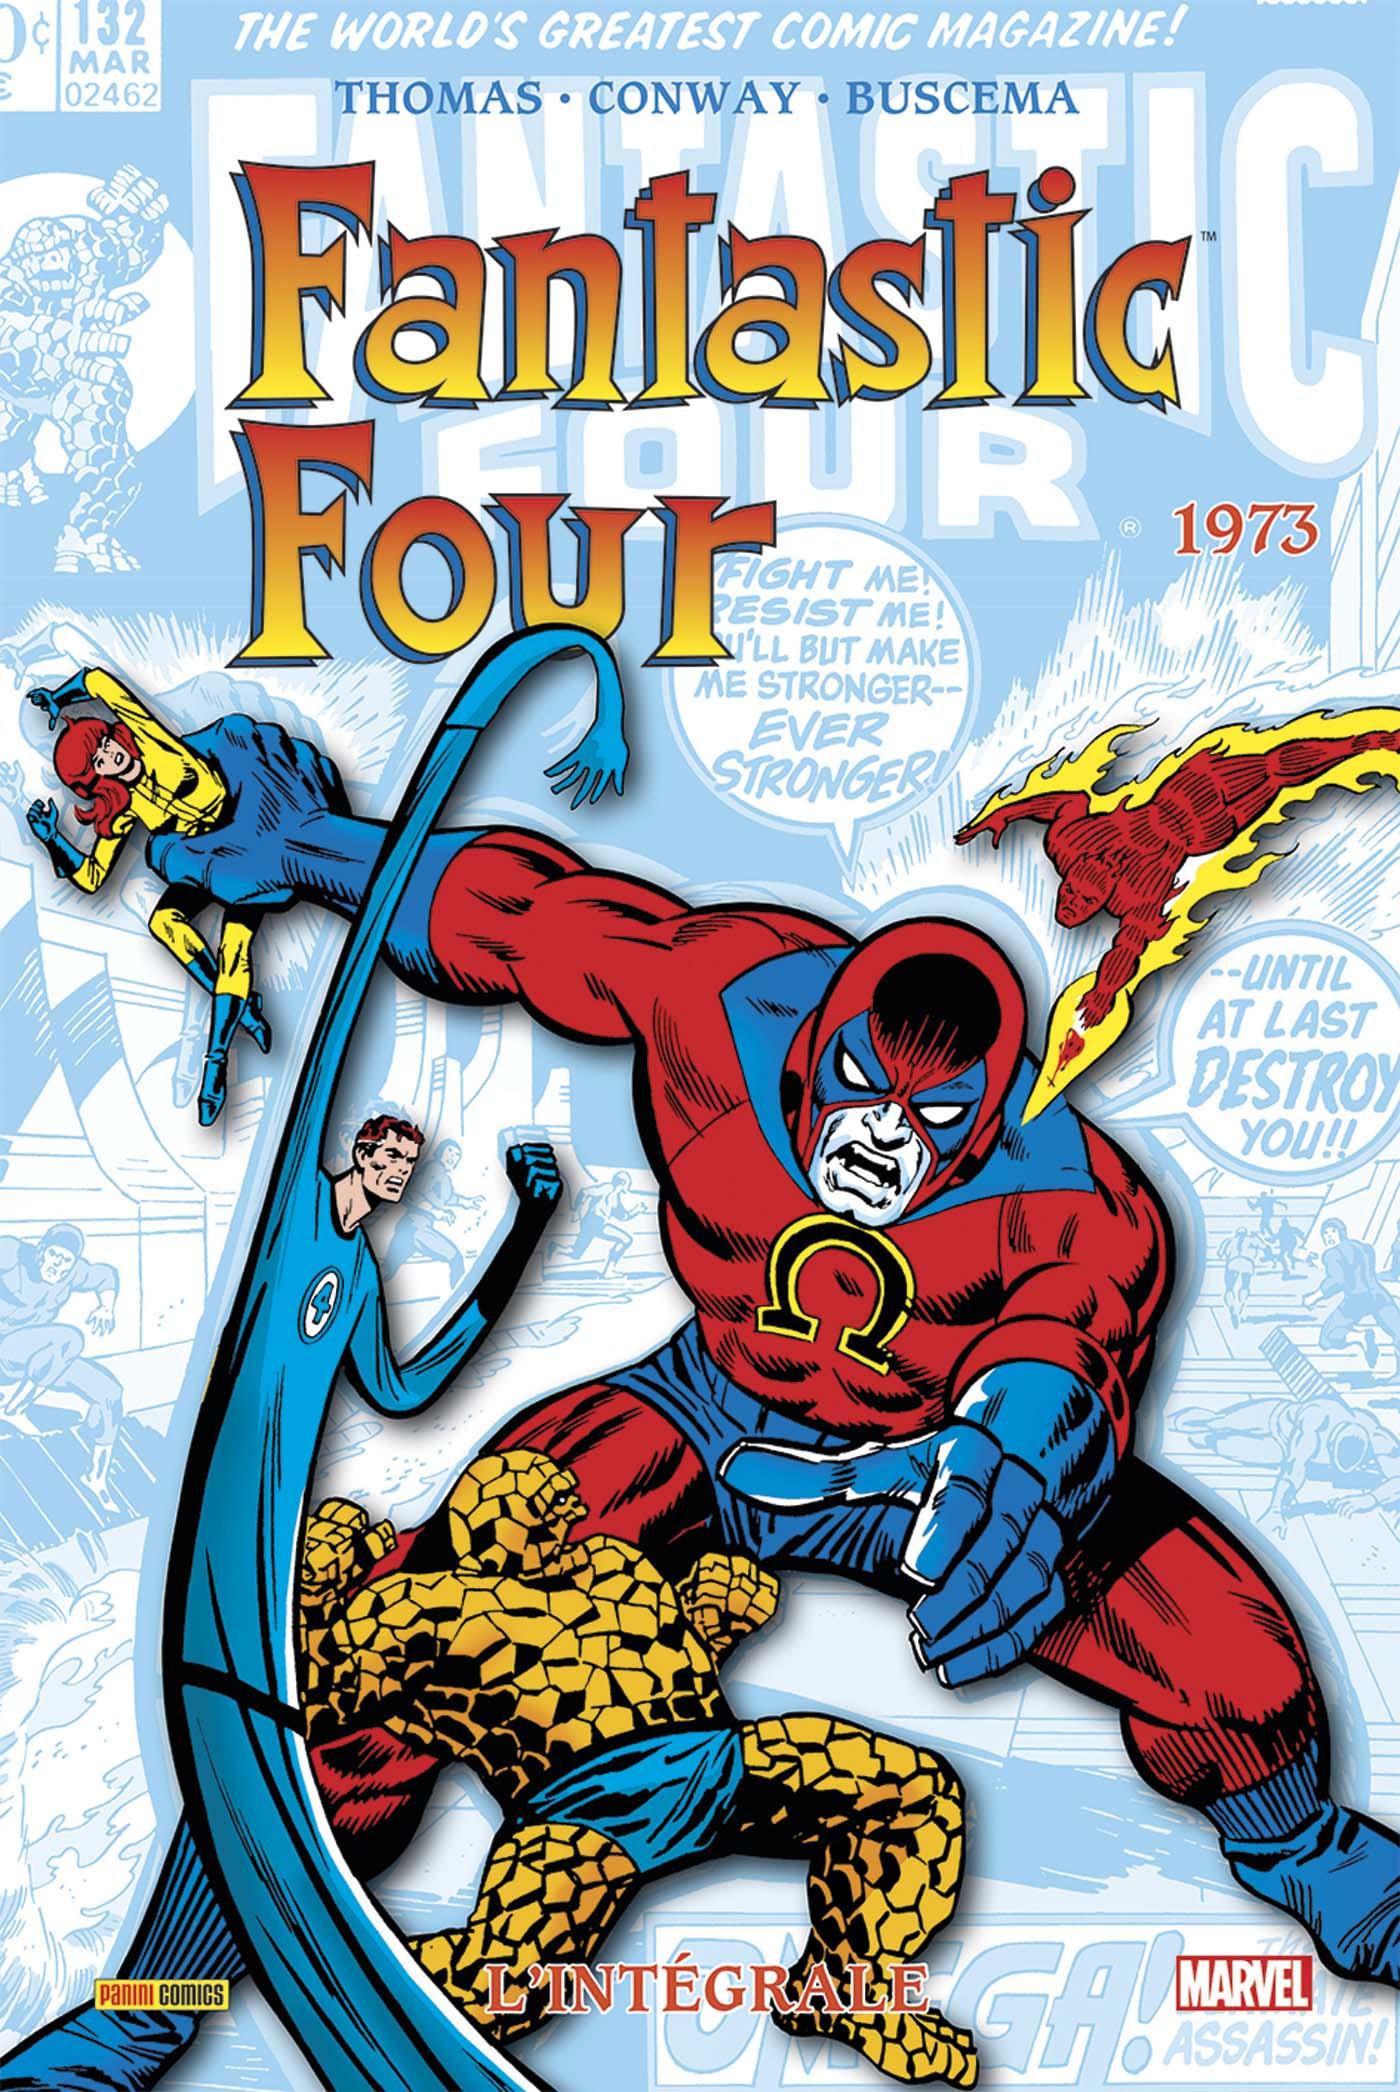 Fantastic Four 1973 - 1973